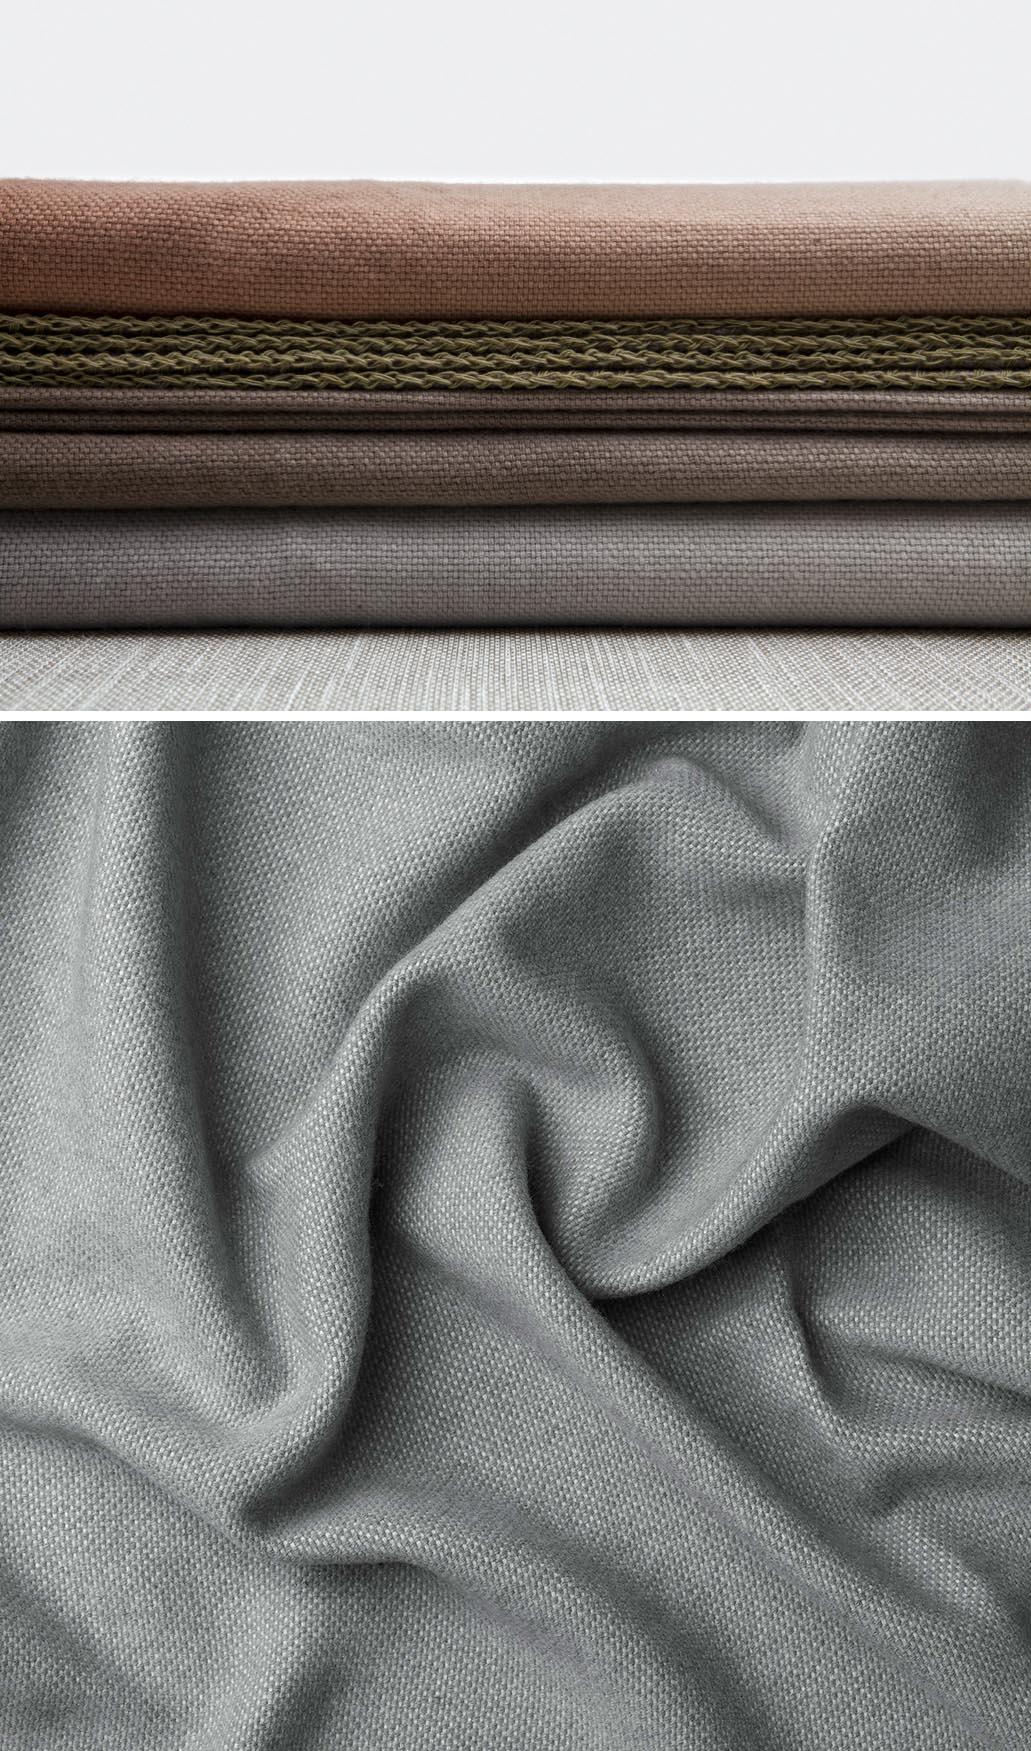 Modern blanket designs from Italian company Molteni&C.